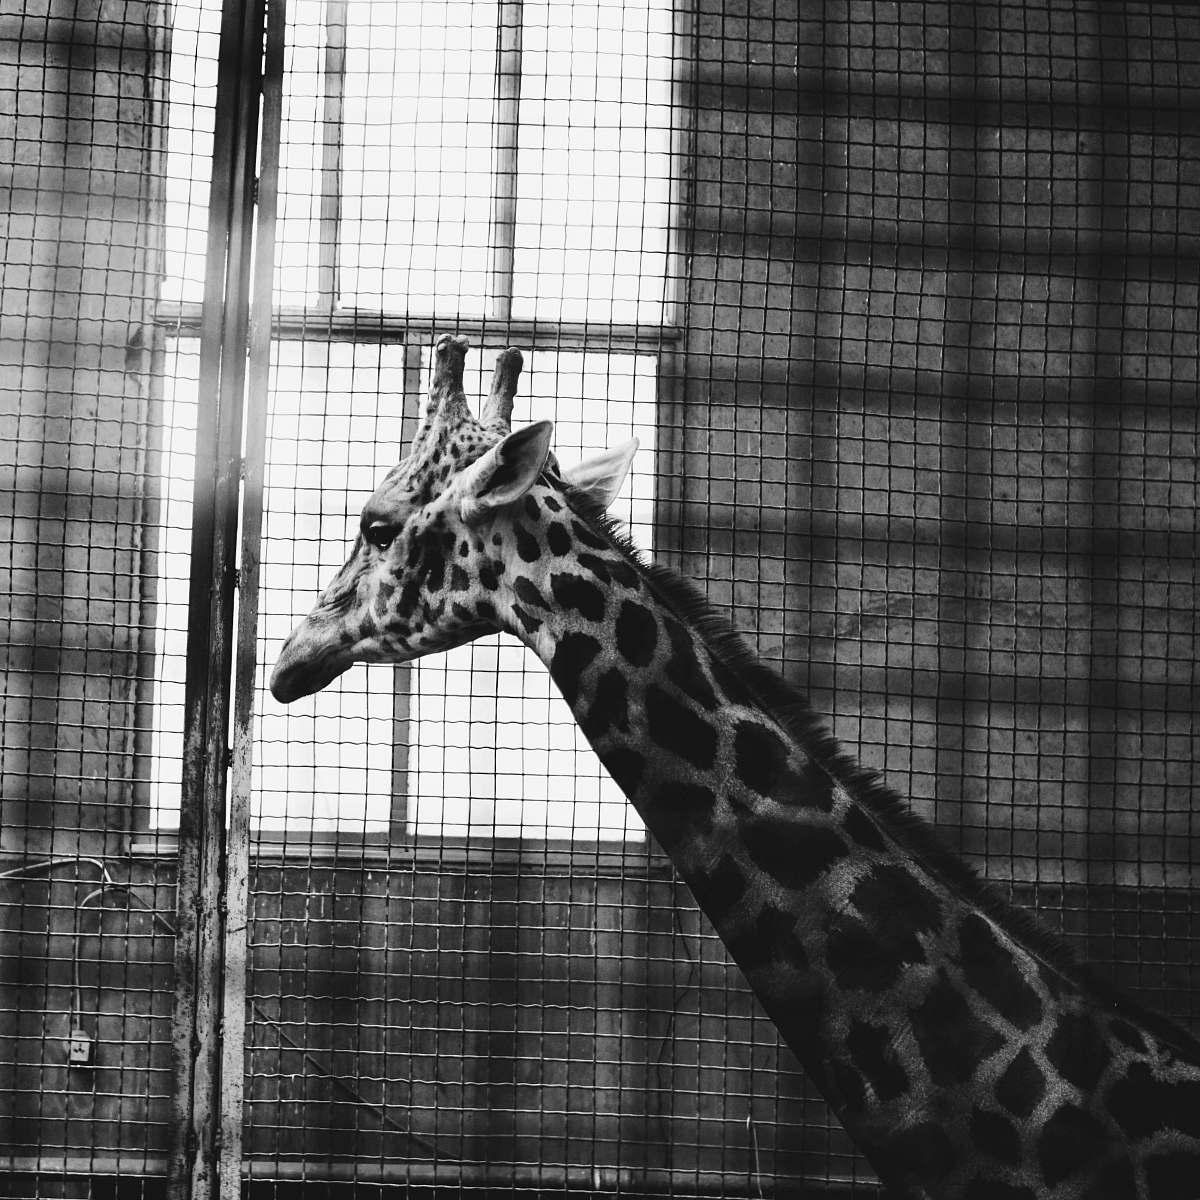 stock photos free  of animal grayscale photo of giraffe zoo